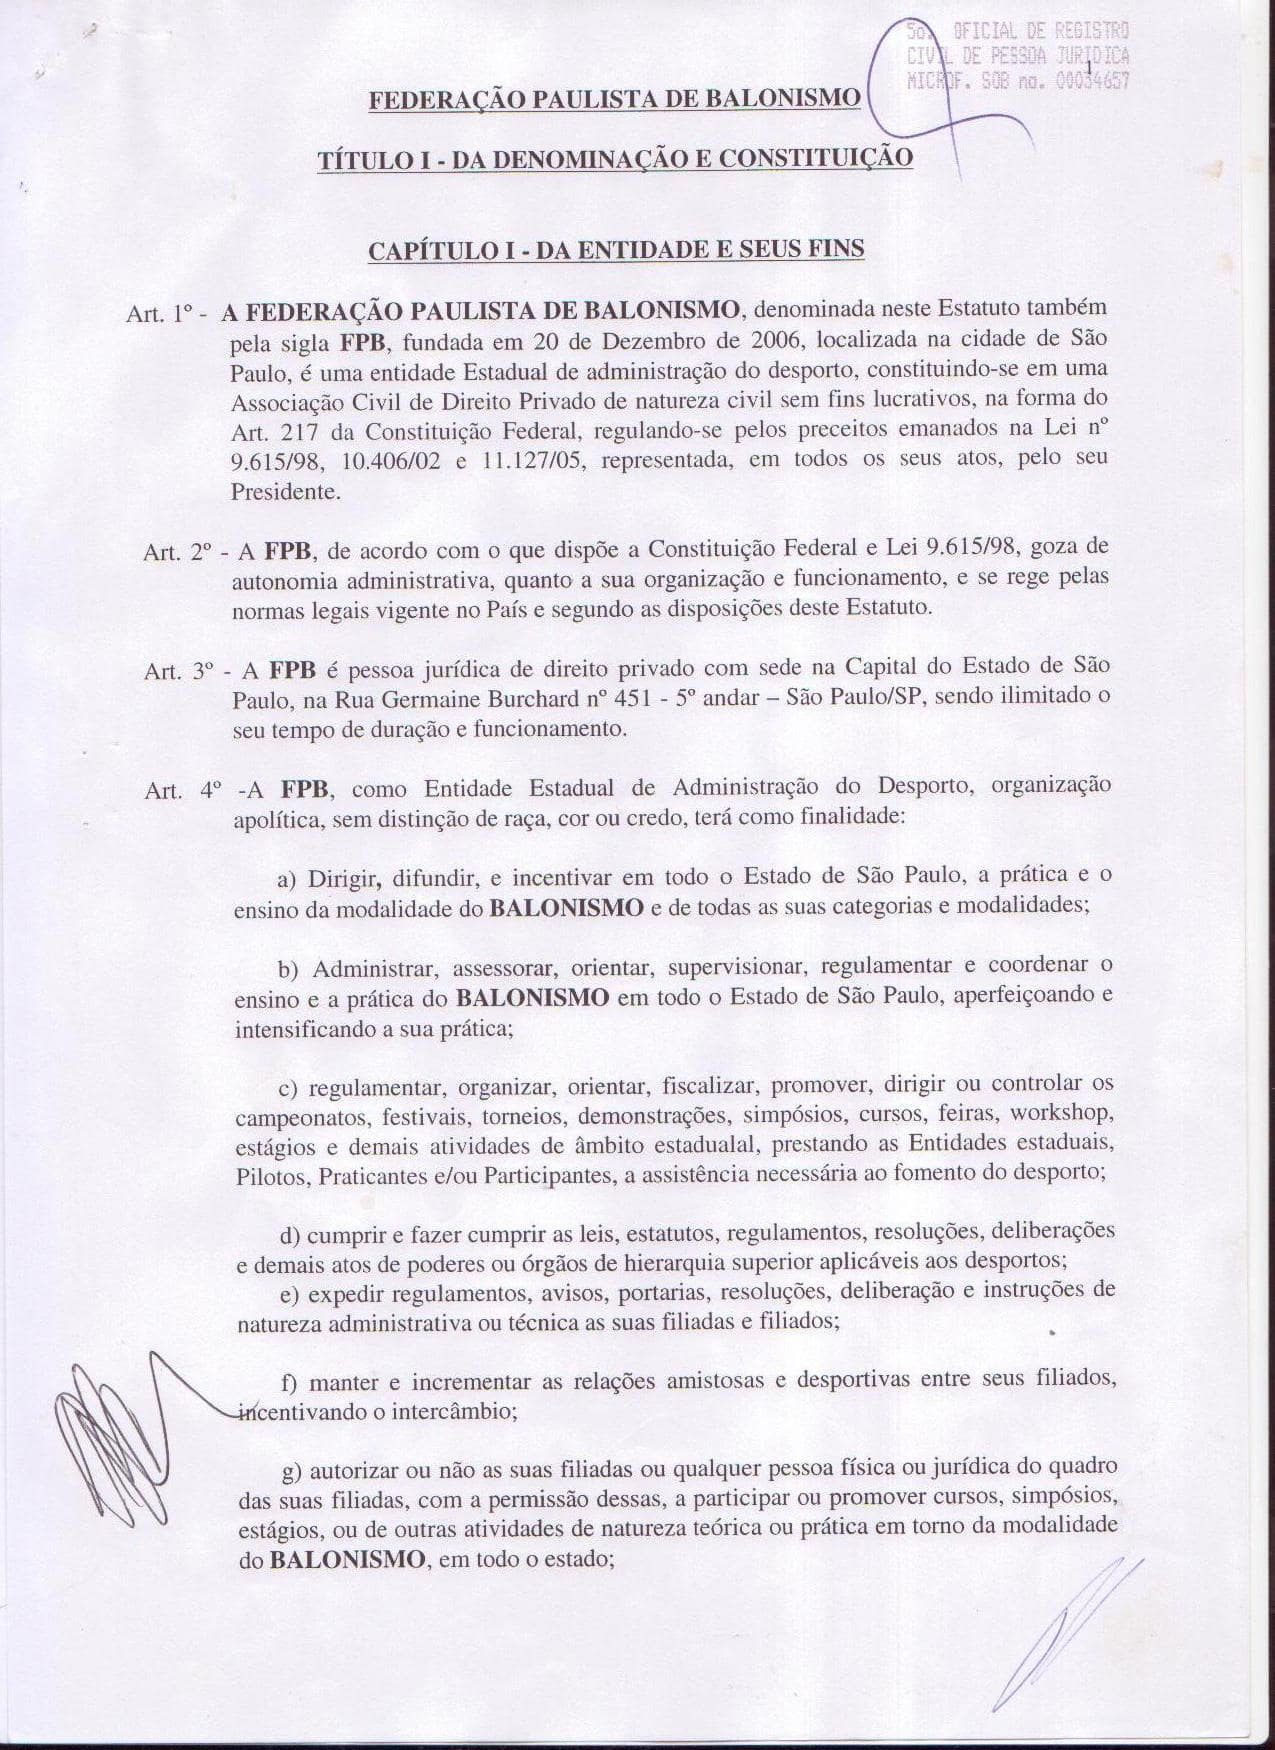 Estatuto da Federacao Paulista de Balonismo (01)